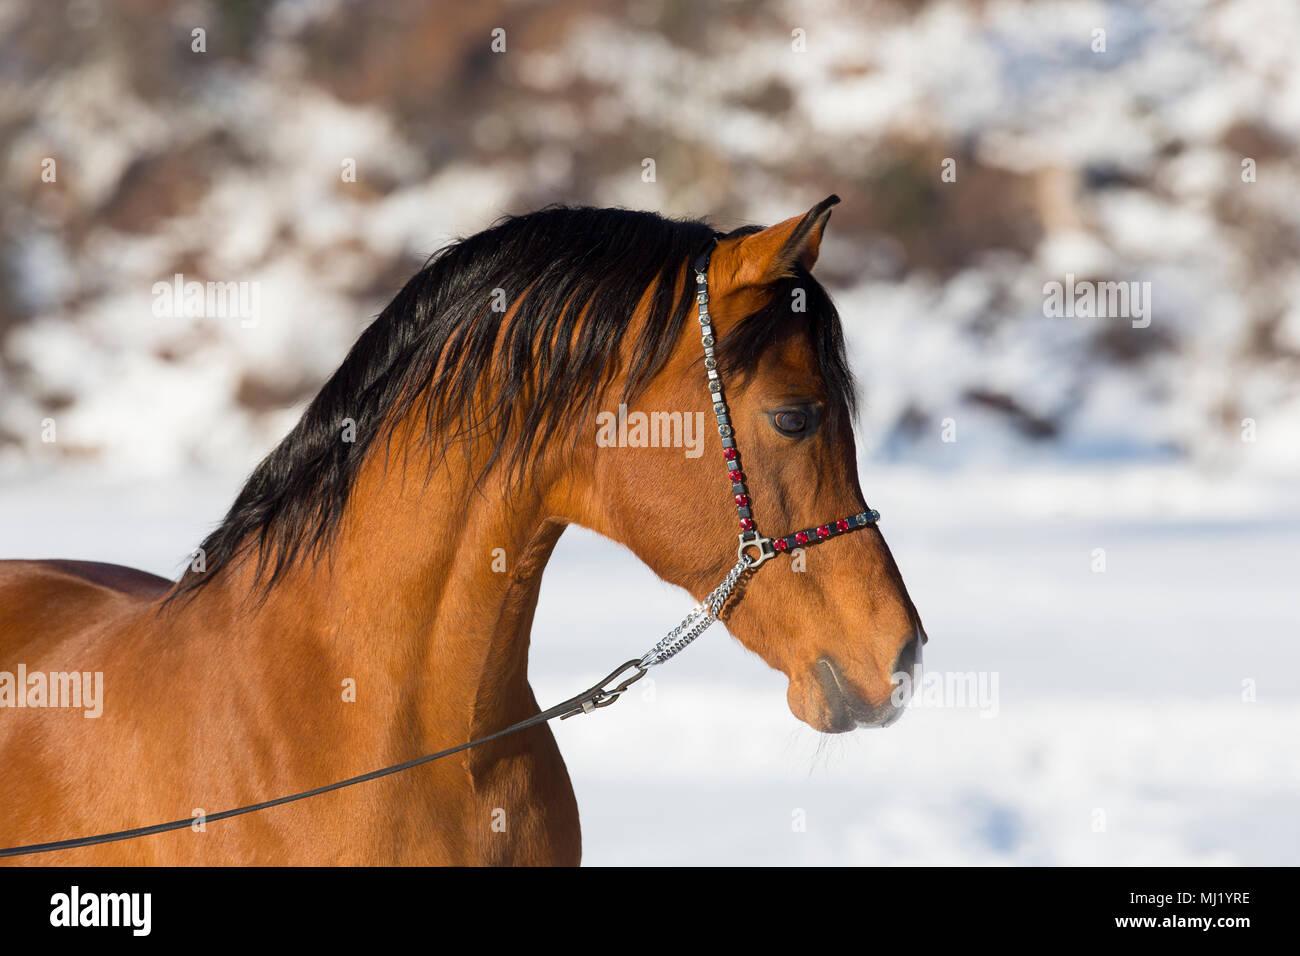 Arabian horse, Arabian stallion, animal portrait in winter, Tyrol, Austria - Stock Image